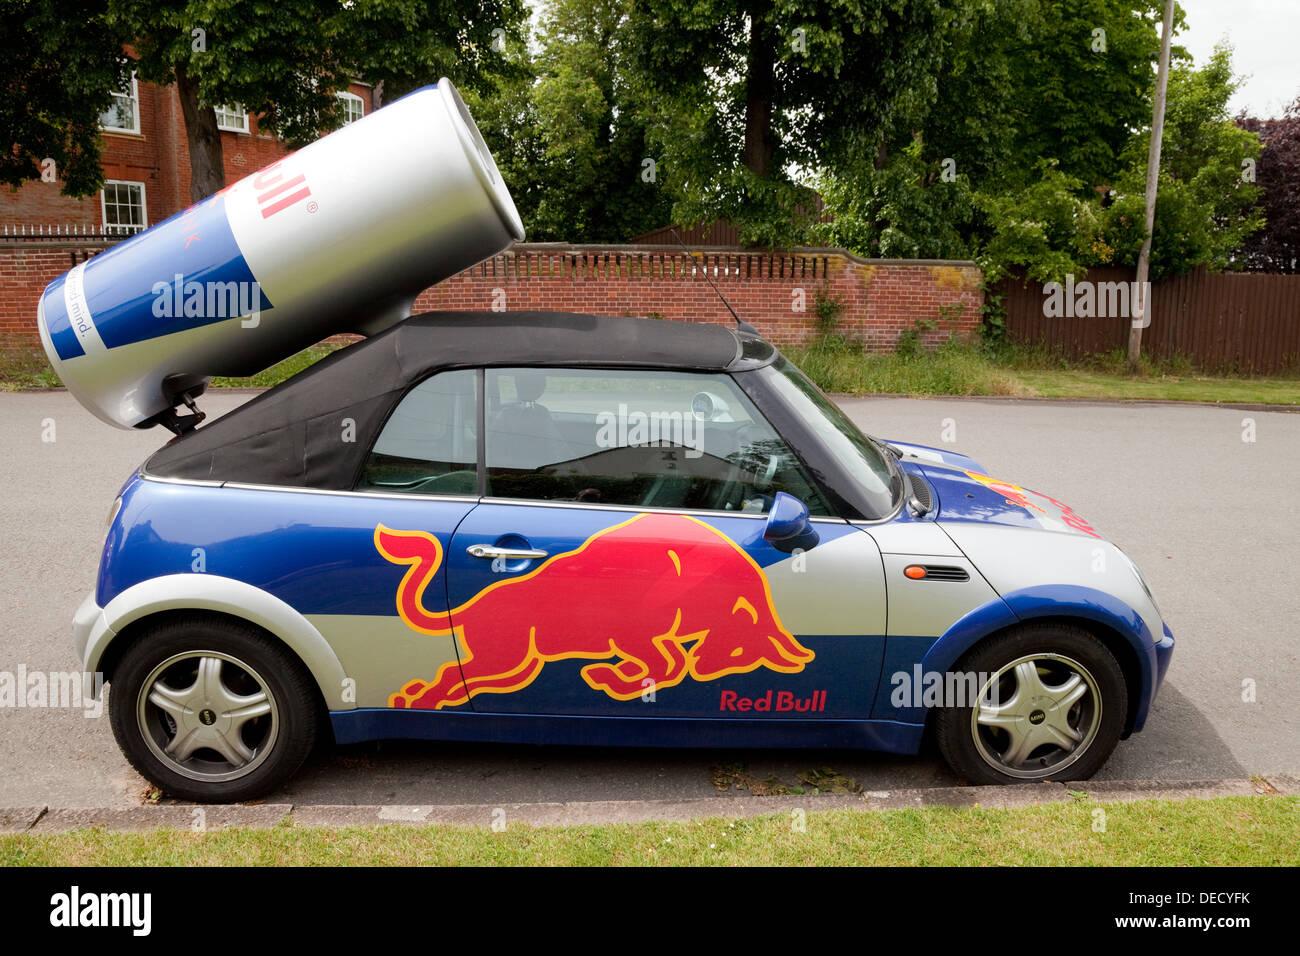 Red Bull Mini Car Uk Stock Photo 60521319 Alamy